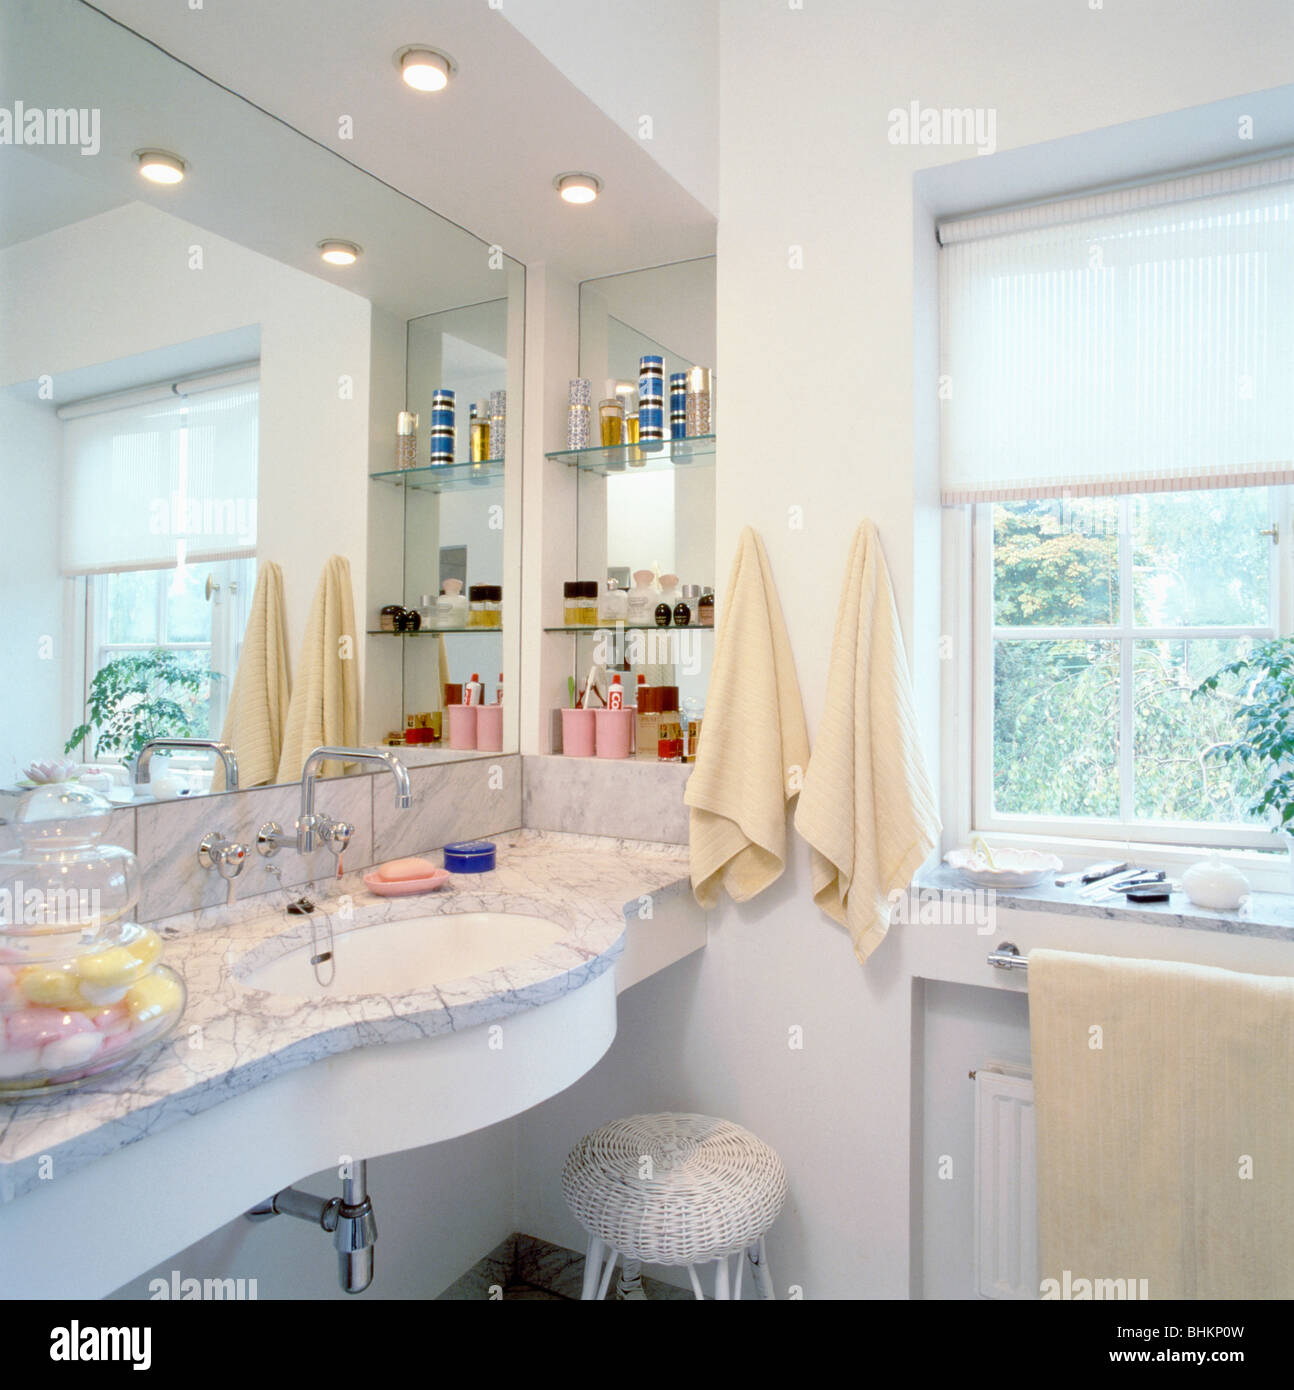 Under set basin in marble vanity unit below mirror and recessed under set basin in marble vanity unit below mirror and recessed lighting in small white bathroom with white blind on window aloadofball Choice Image